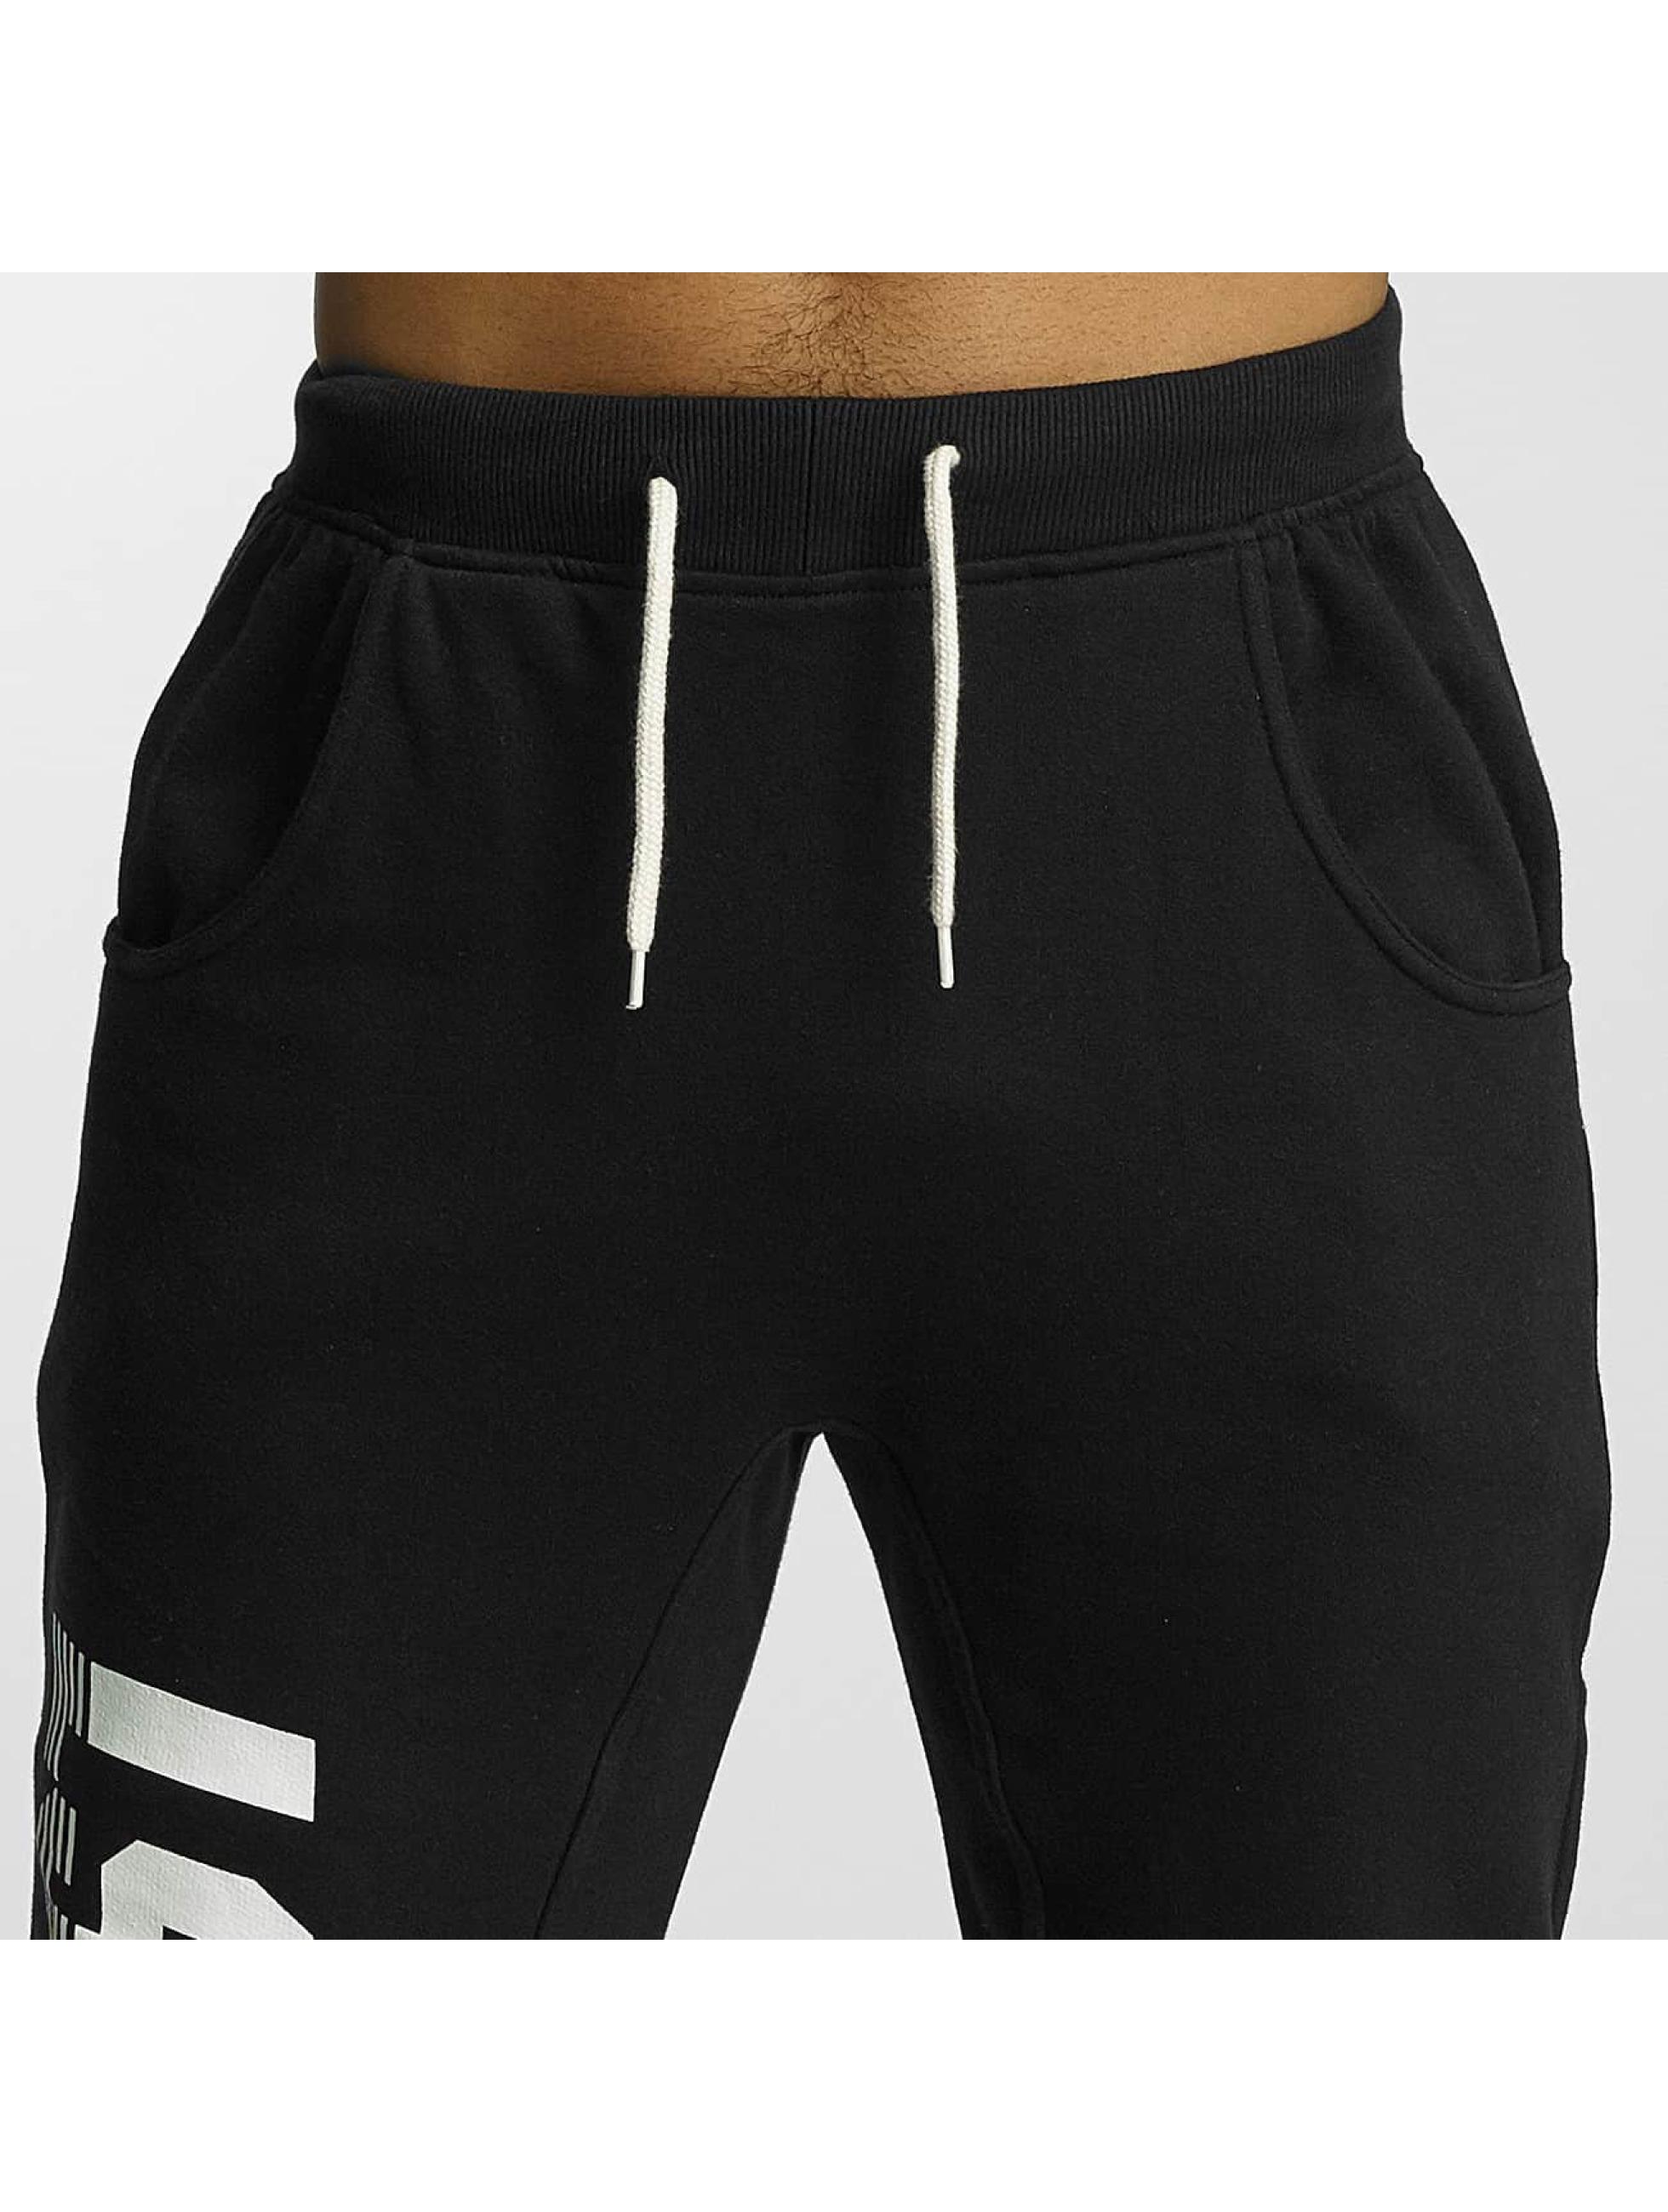 Kingin Jogging kalhoty Osiris čern